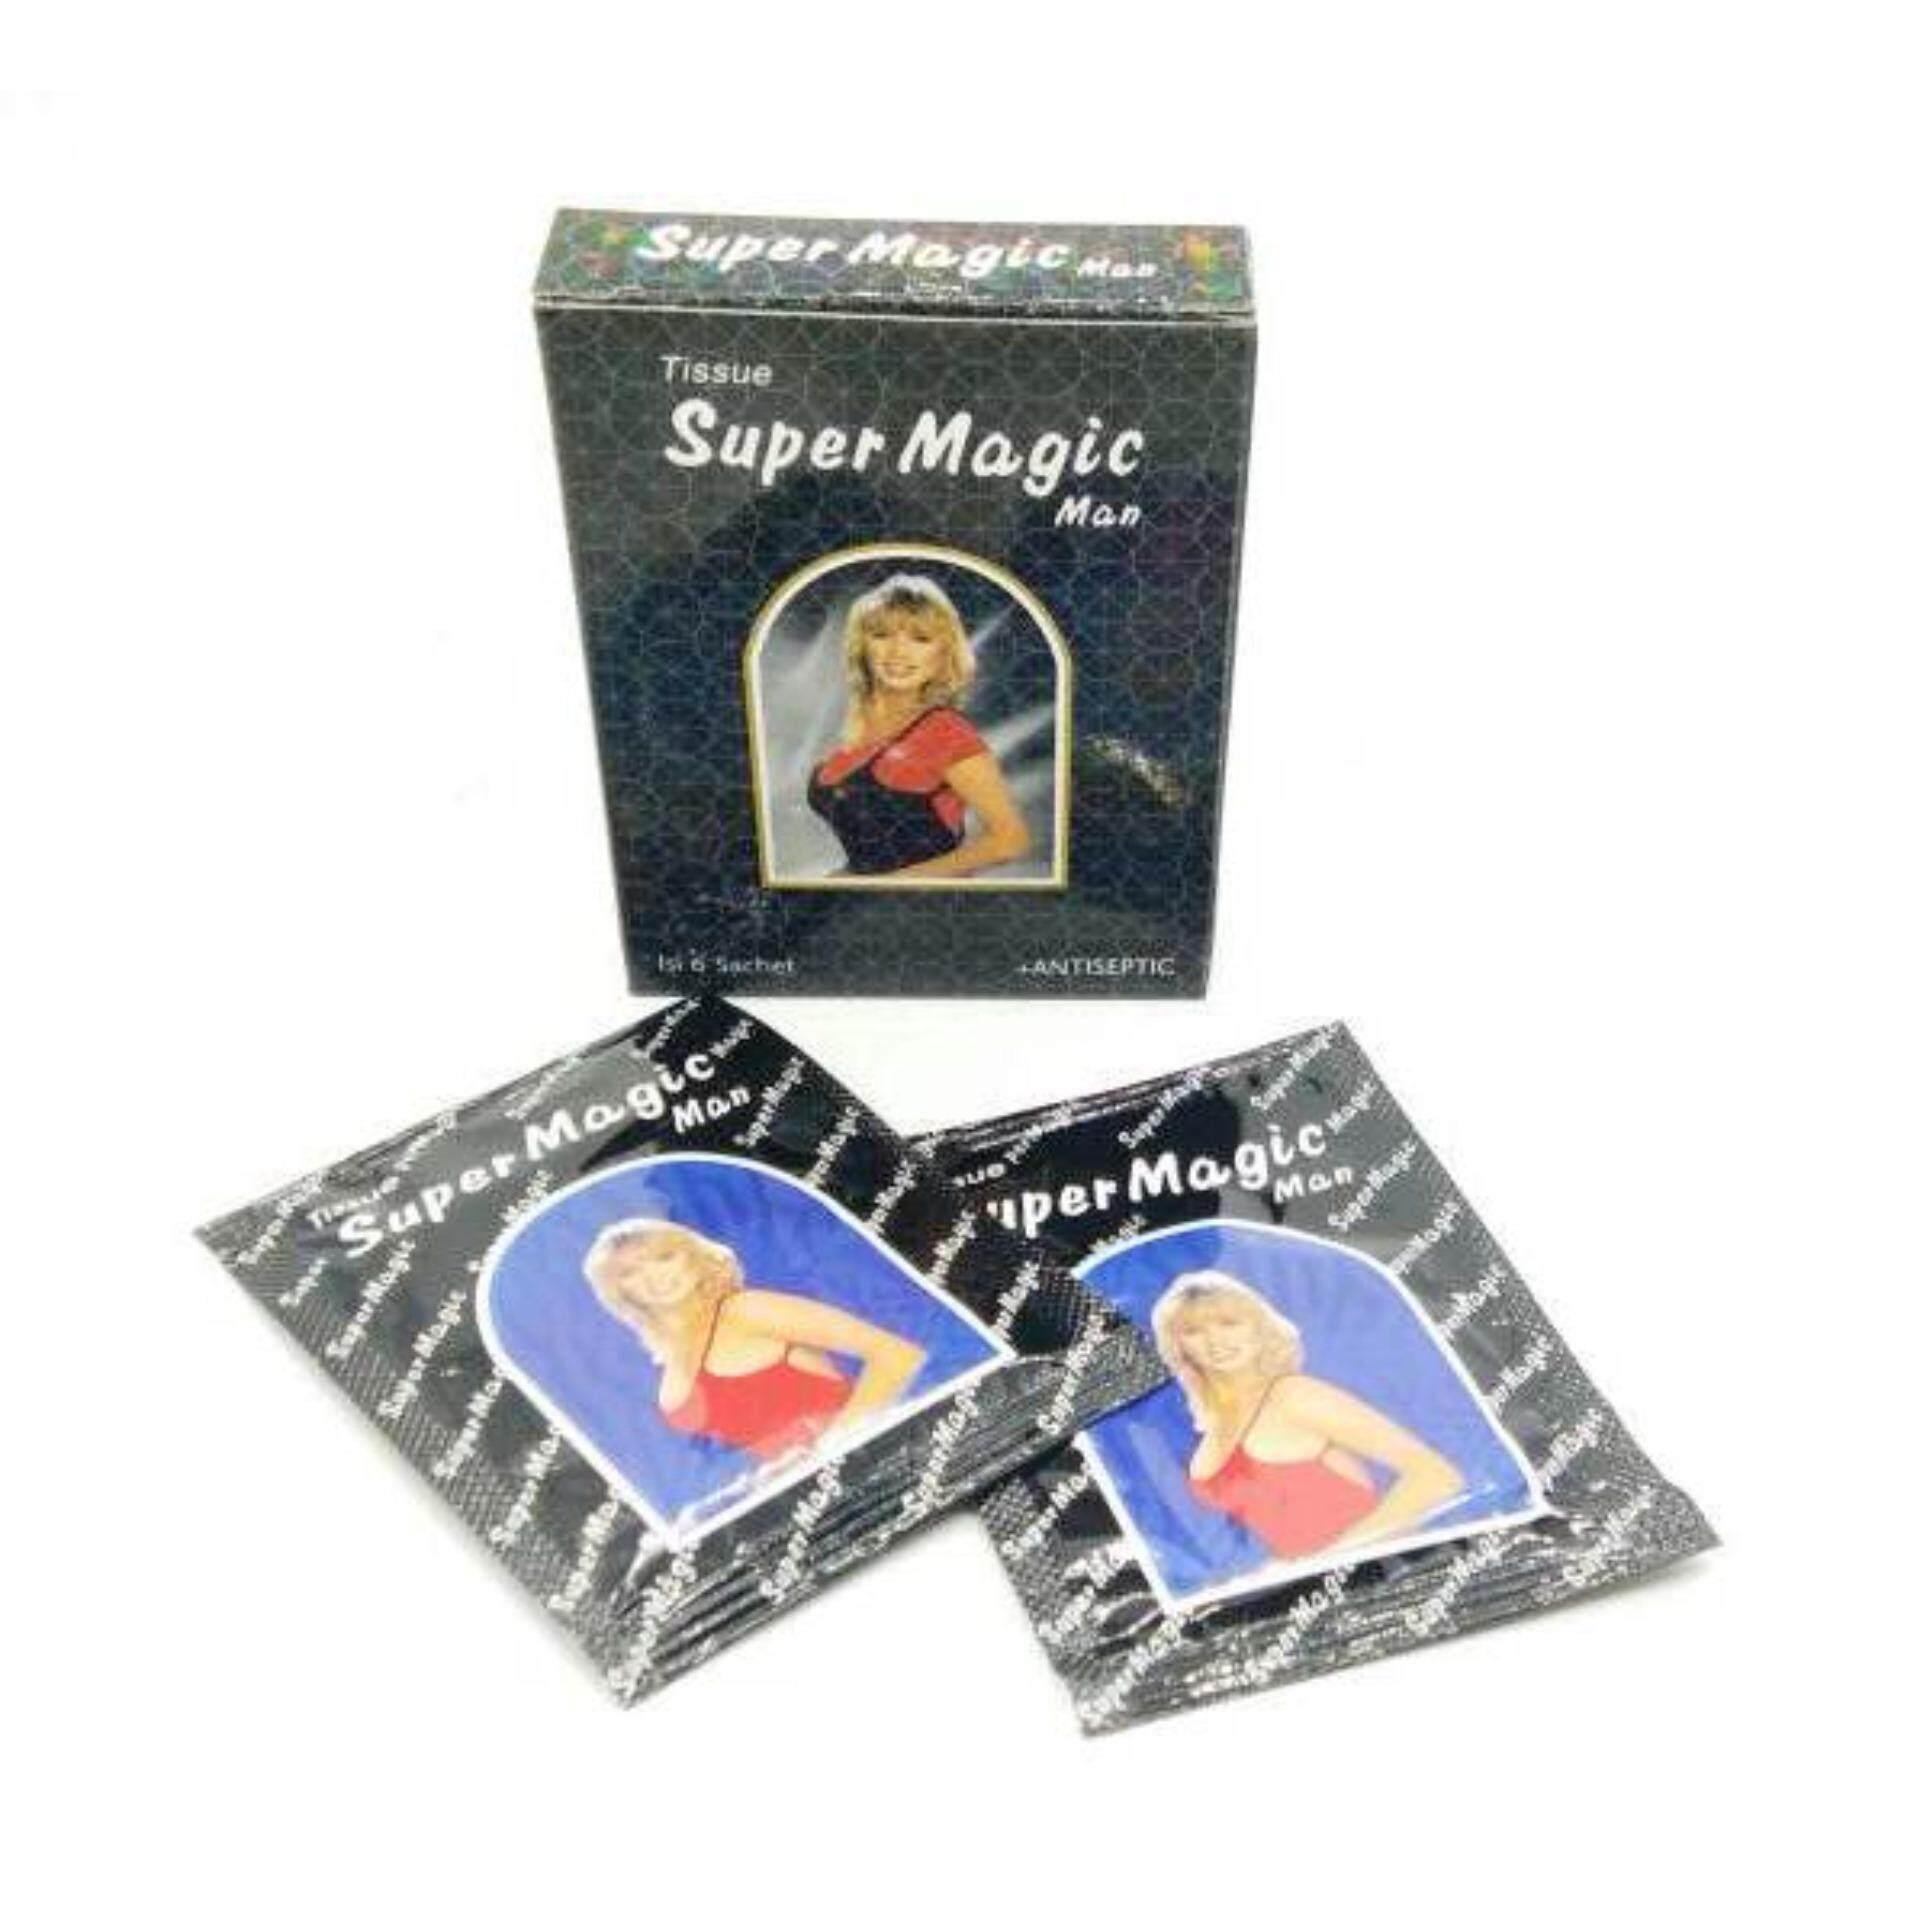 Super Magic Tissue Aroma Casanova Sachet 6 Daftar Harga Terbaru Tisu Man 1 Box